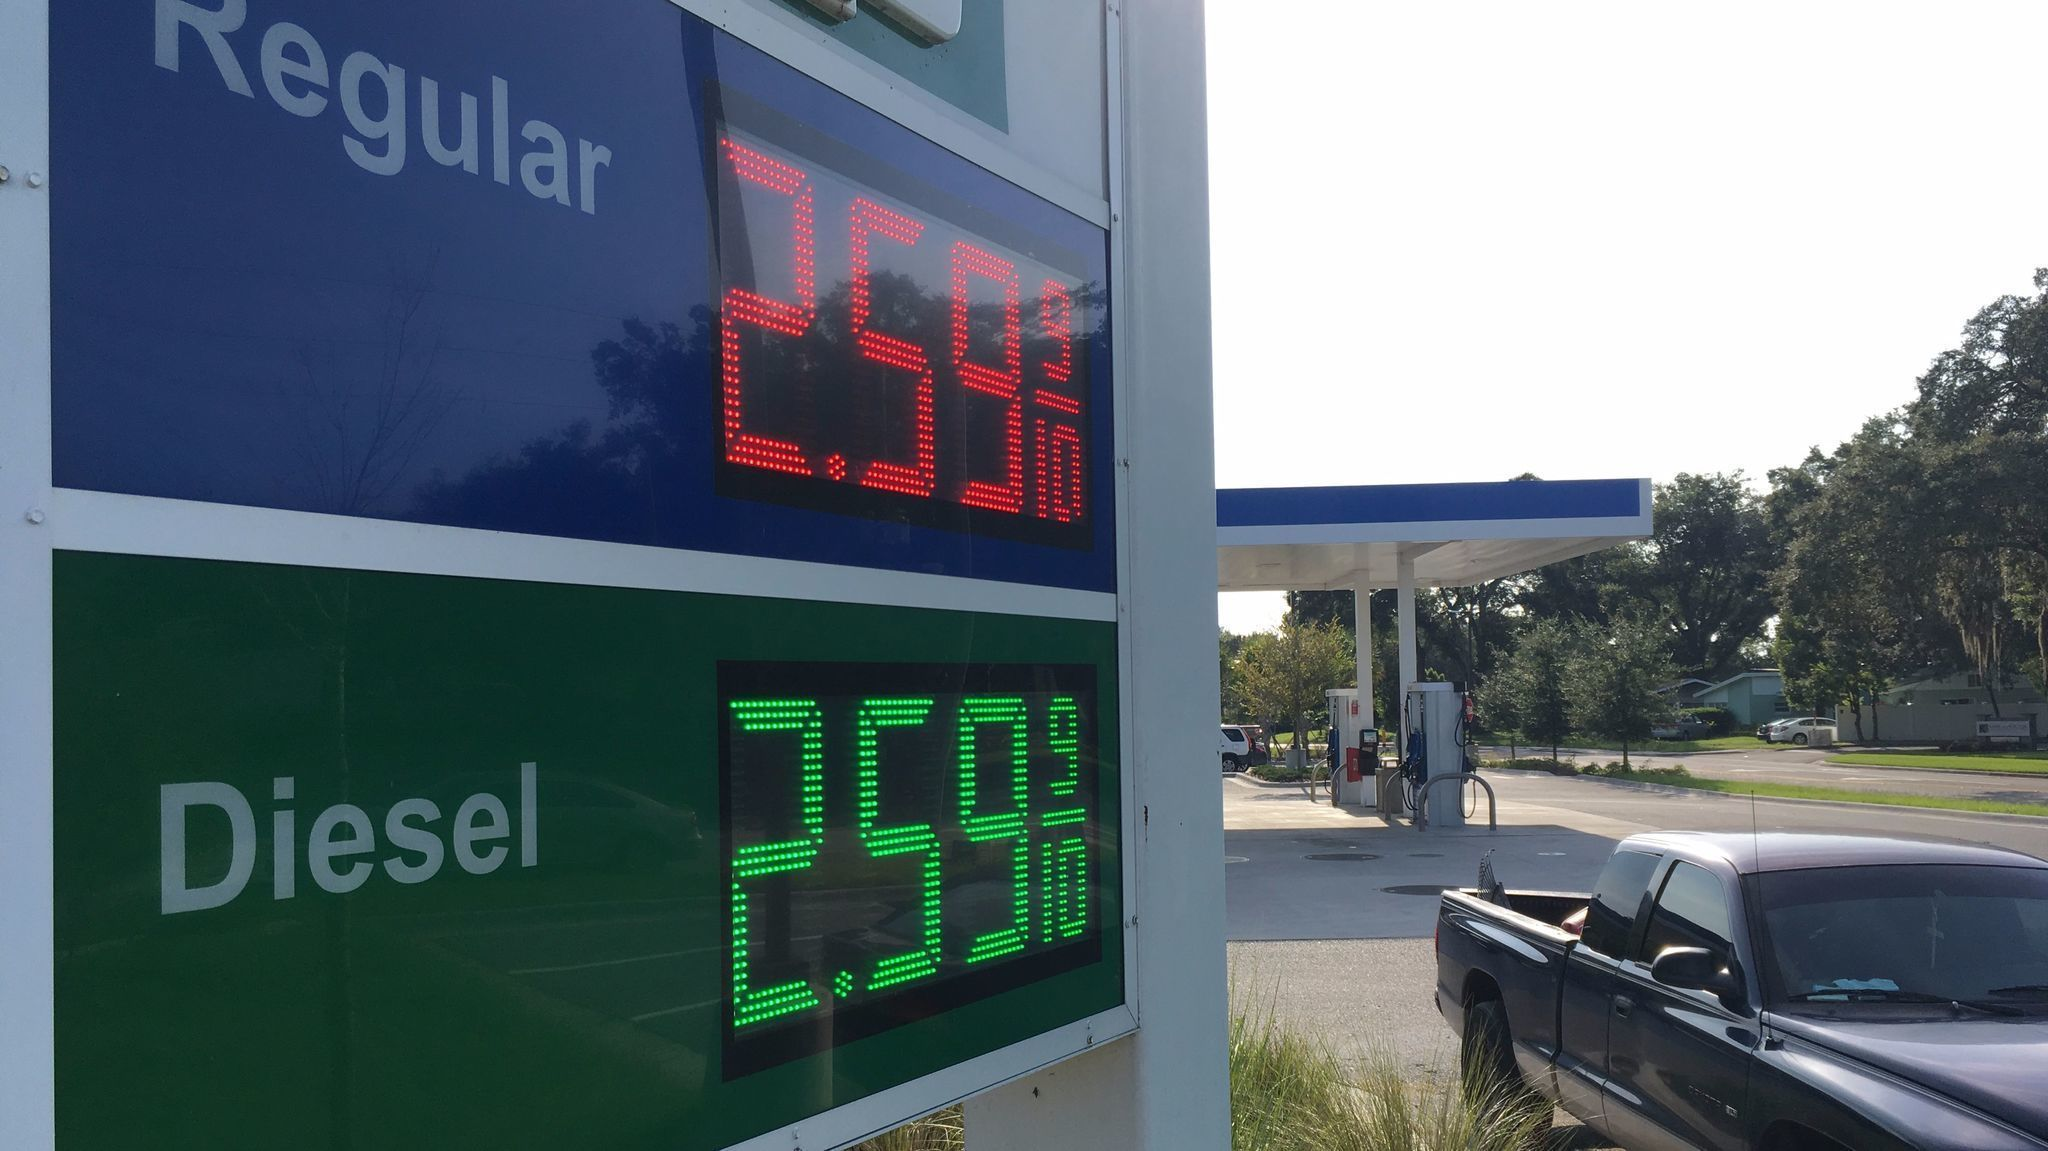 harvey s wrath sends gas prices soaring in central florida orlando sentinel